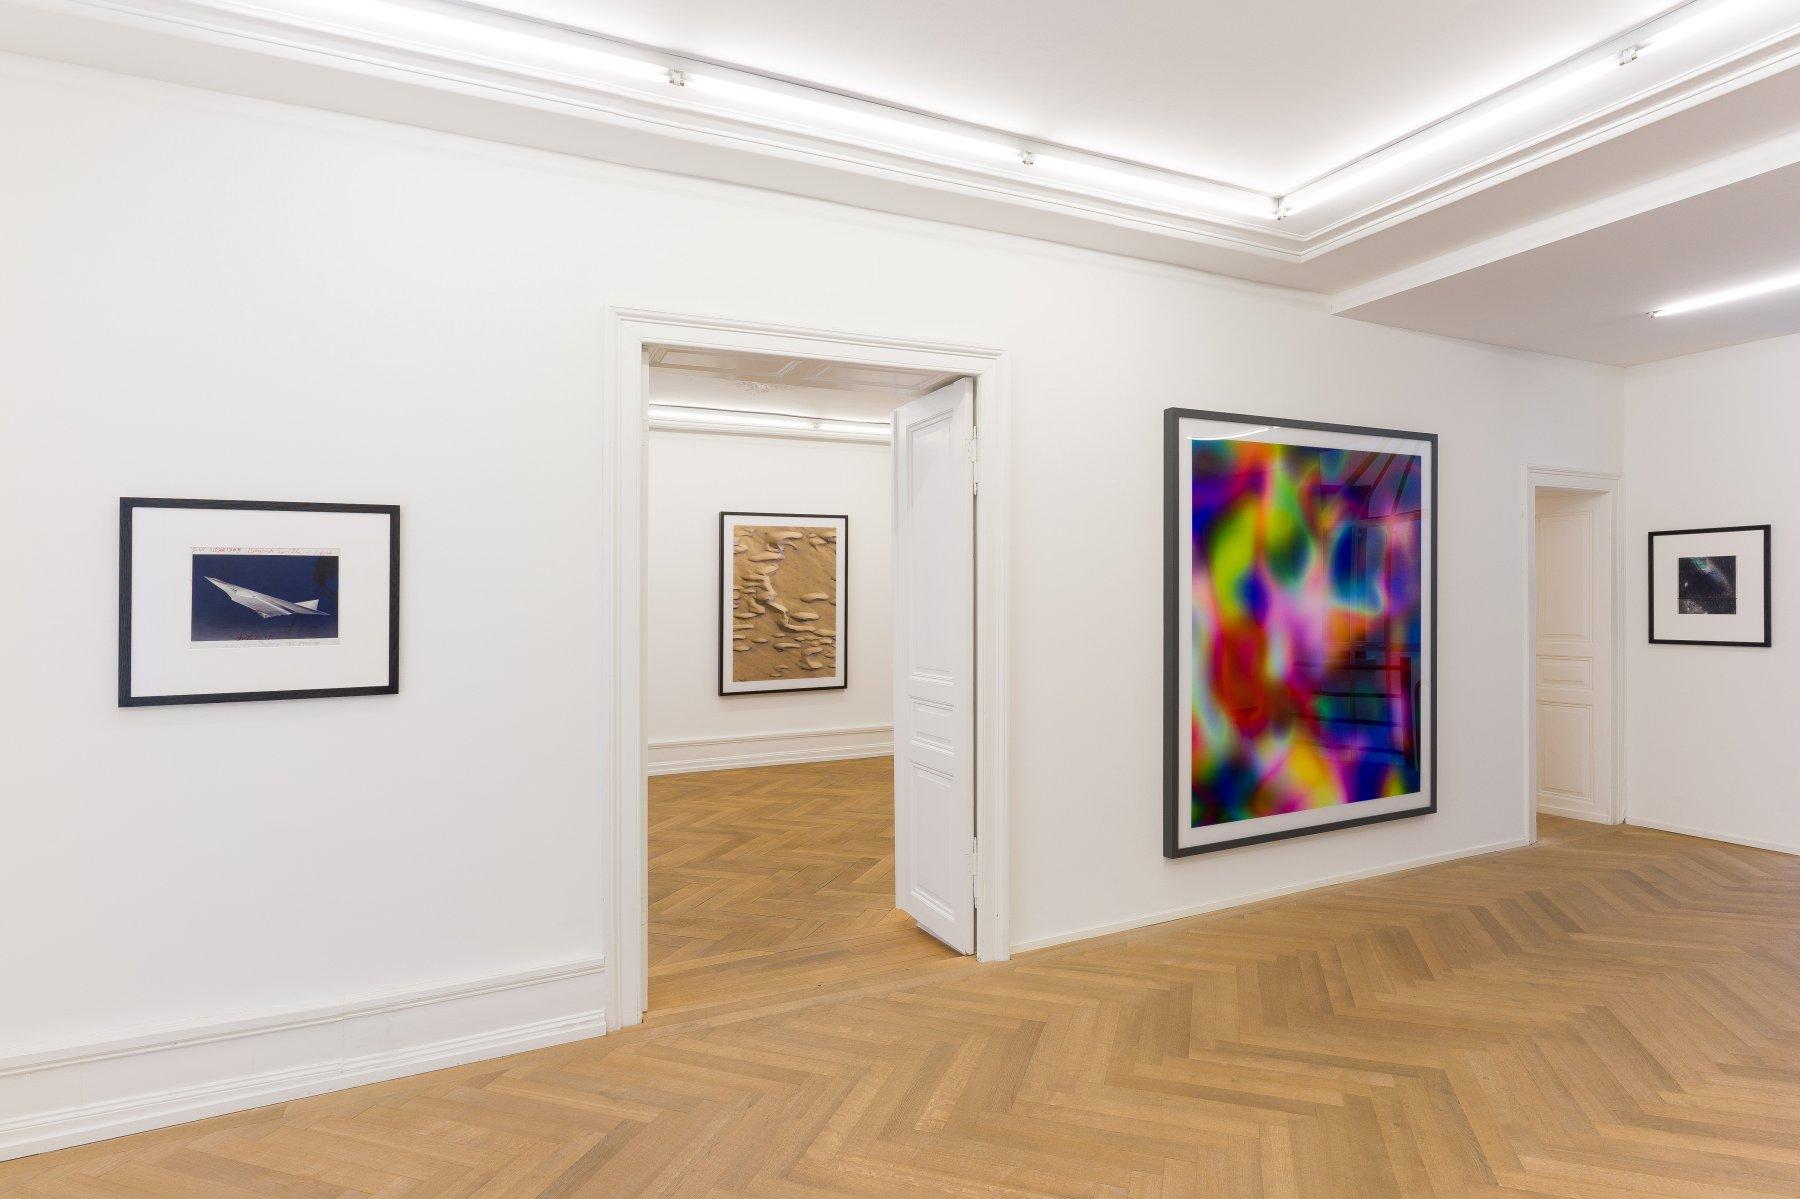 Mai 36 Thomas Ruff Works 1981 - 2021 1